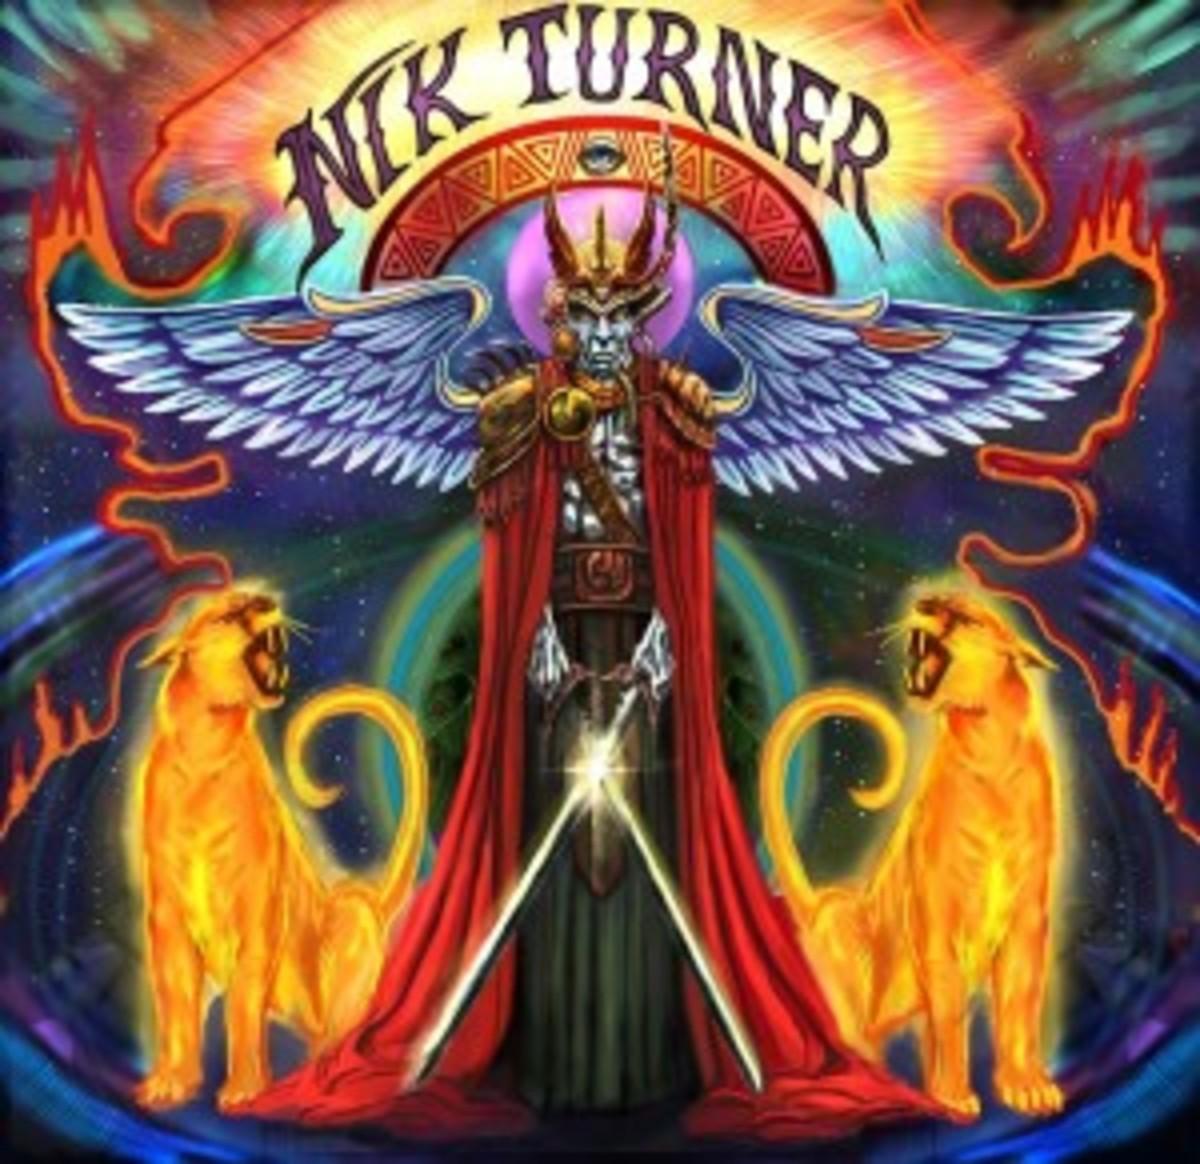 0661-nik-turner